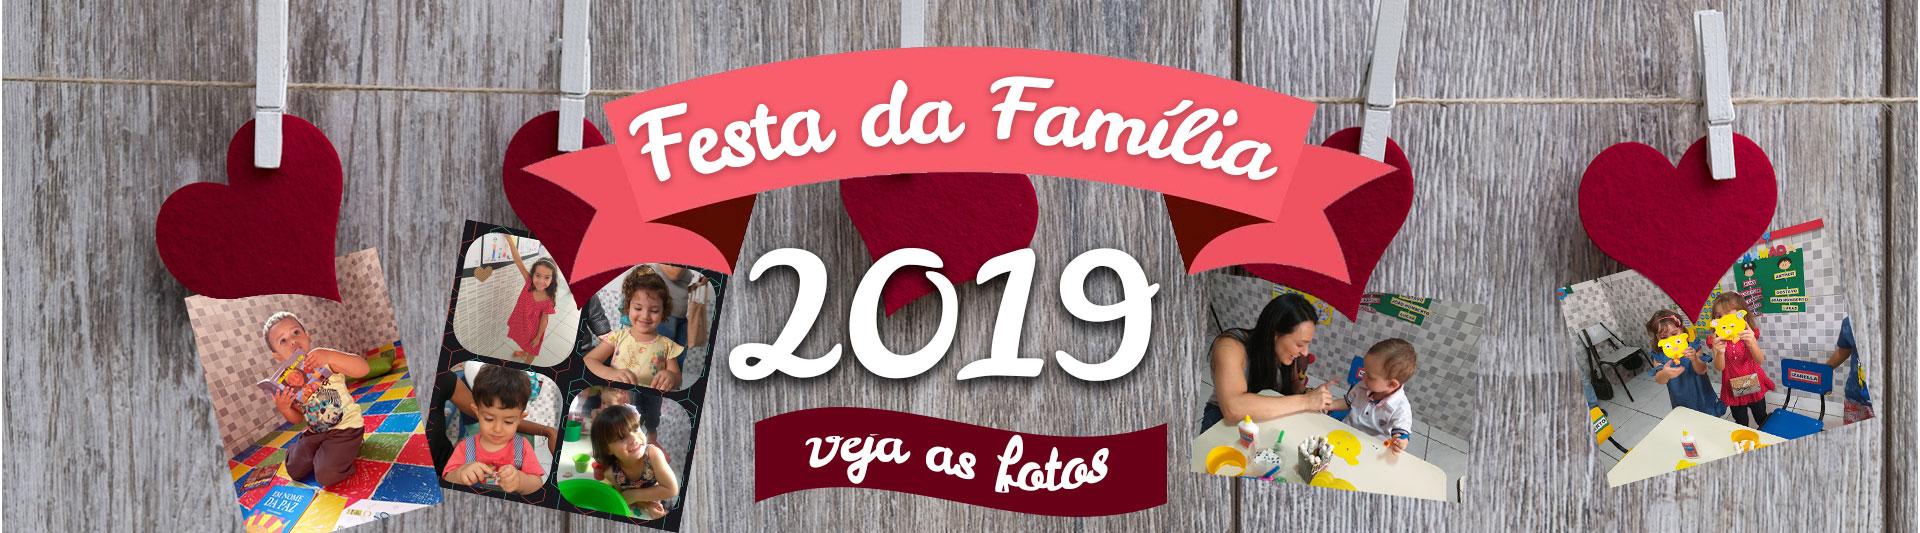 banner-festa-familia-2019